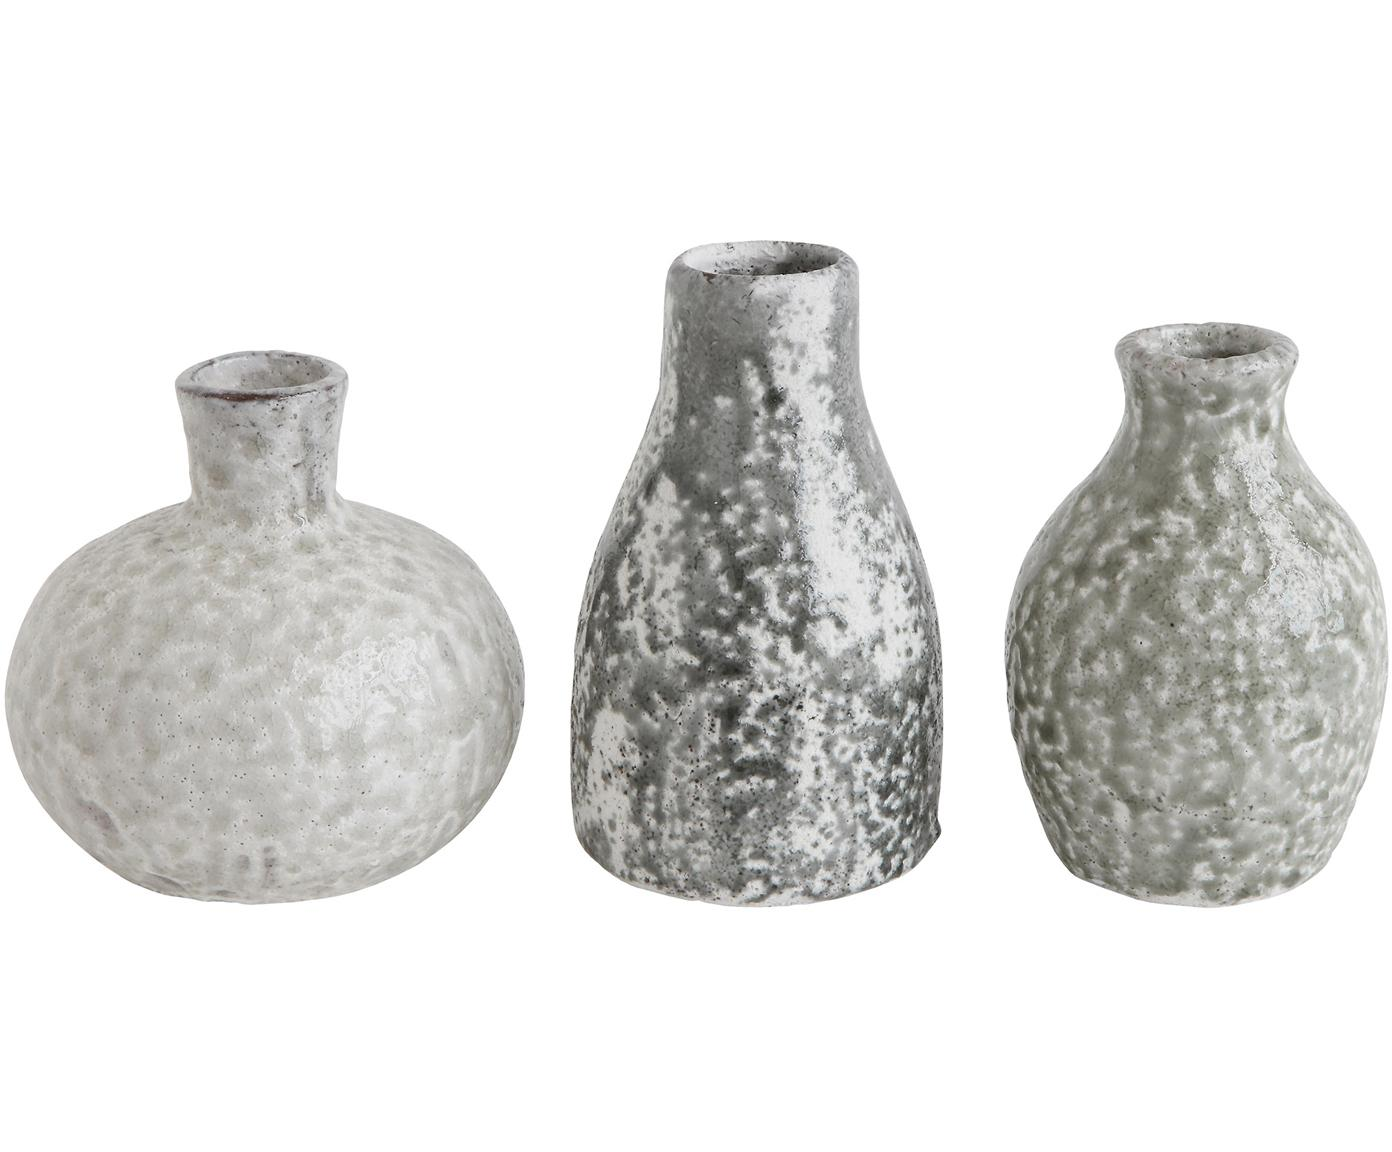 Deko-Vasen-Set Kronos aus Terracotta, 3-tlg., Terrakotta, Grautöne, Sondergrößen